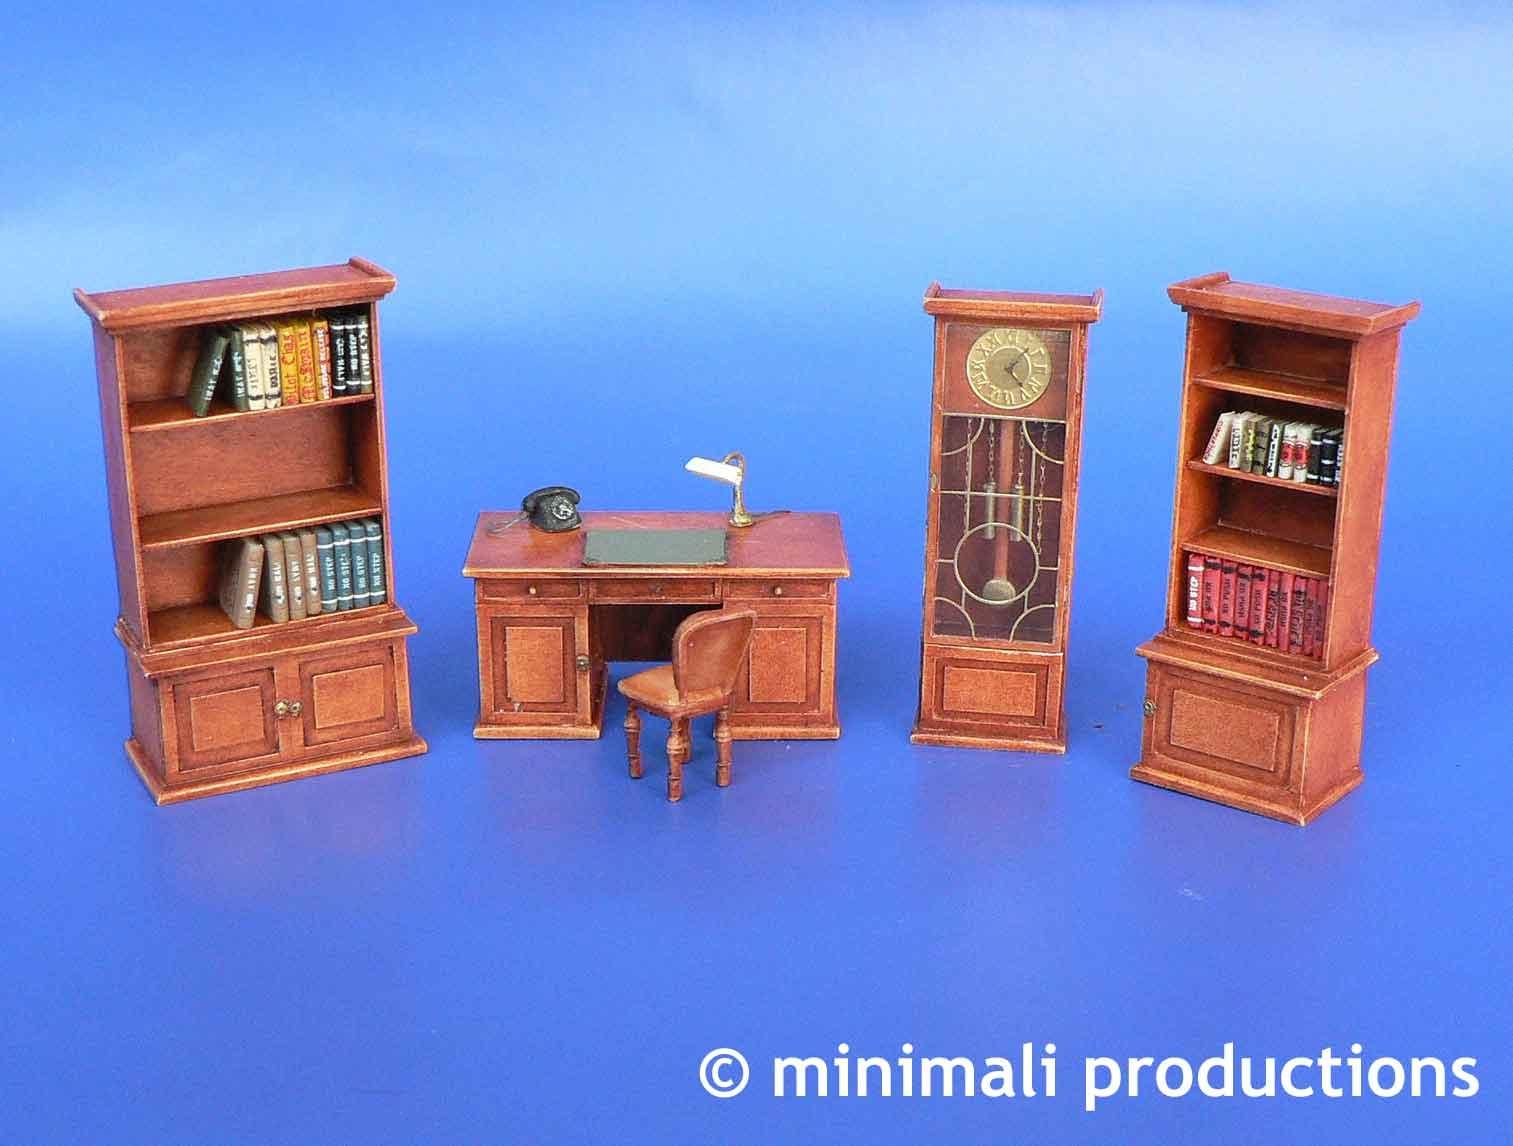 Minimali Productions Office Furniture - Scale 1/48 - Minimali Productions - Mii 046